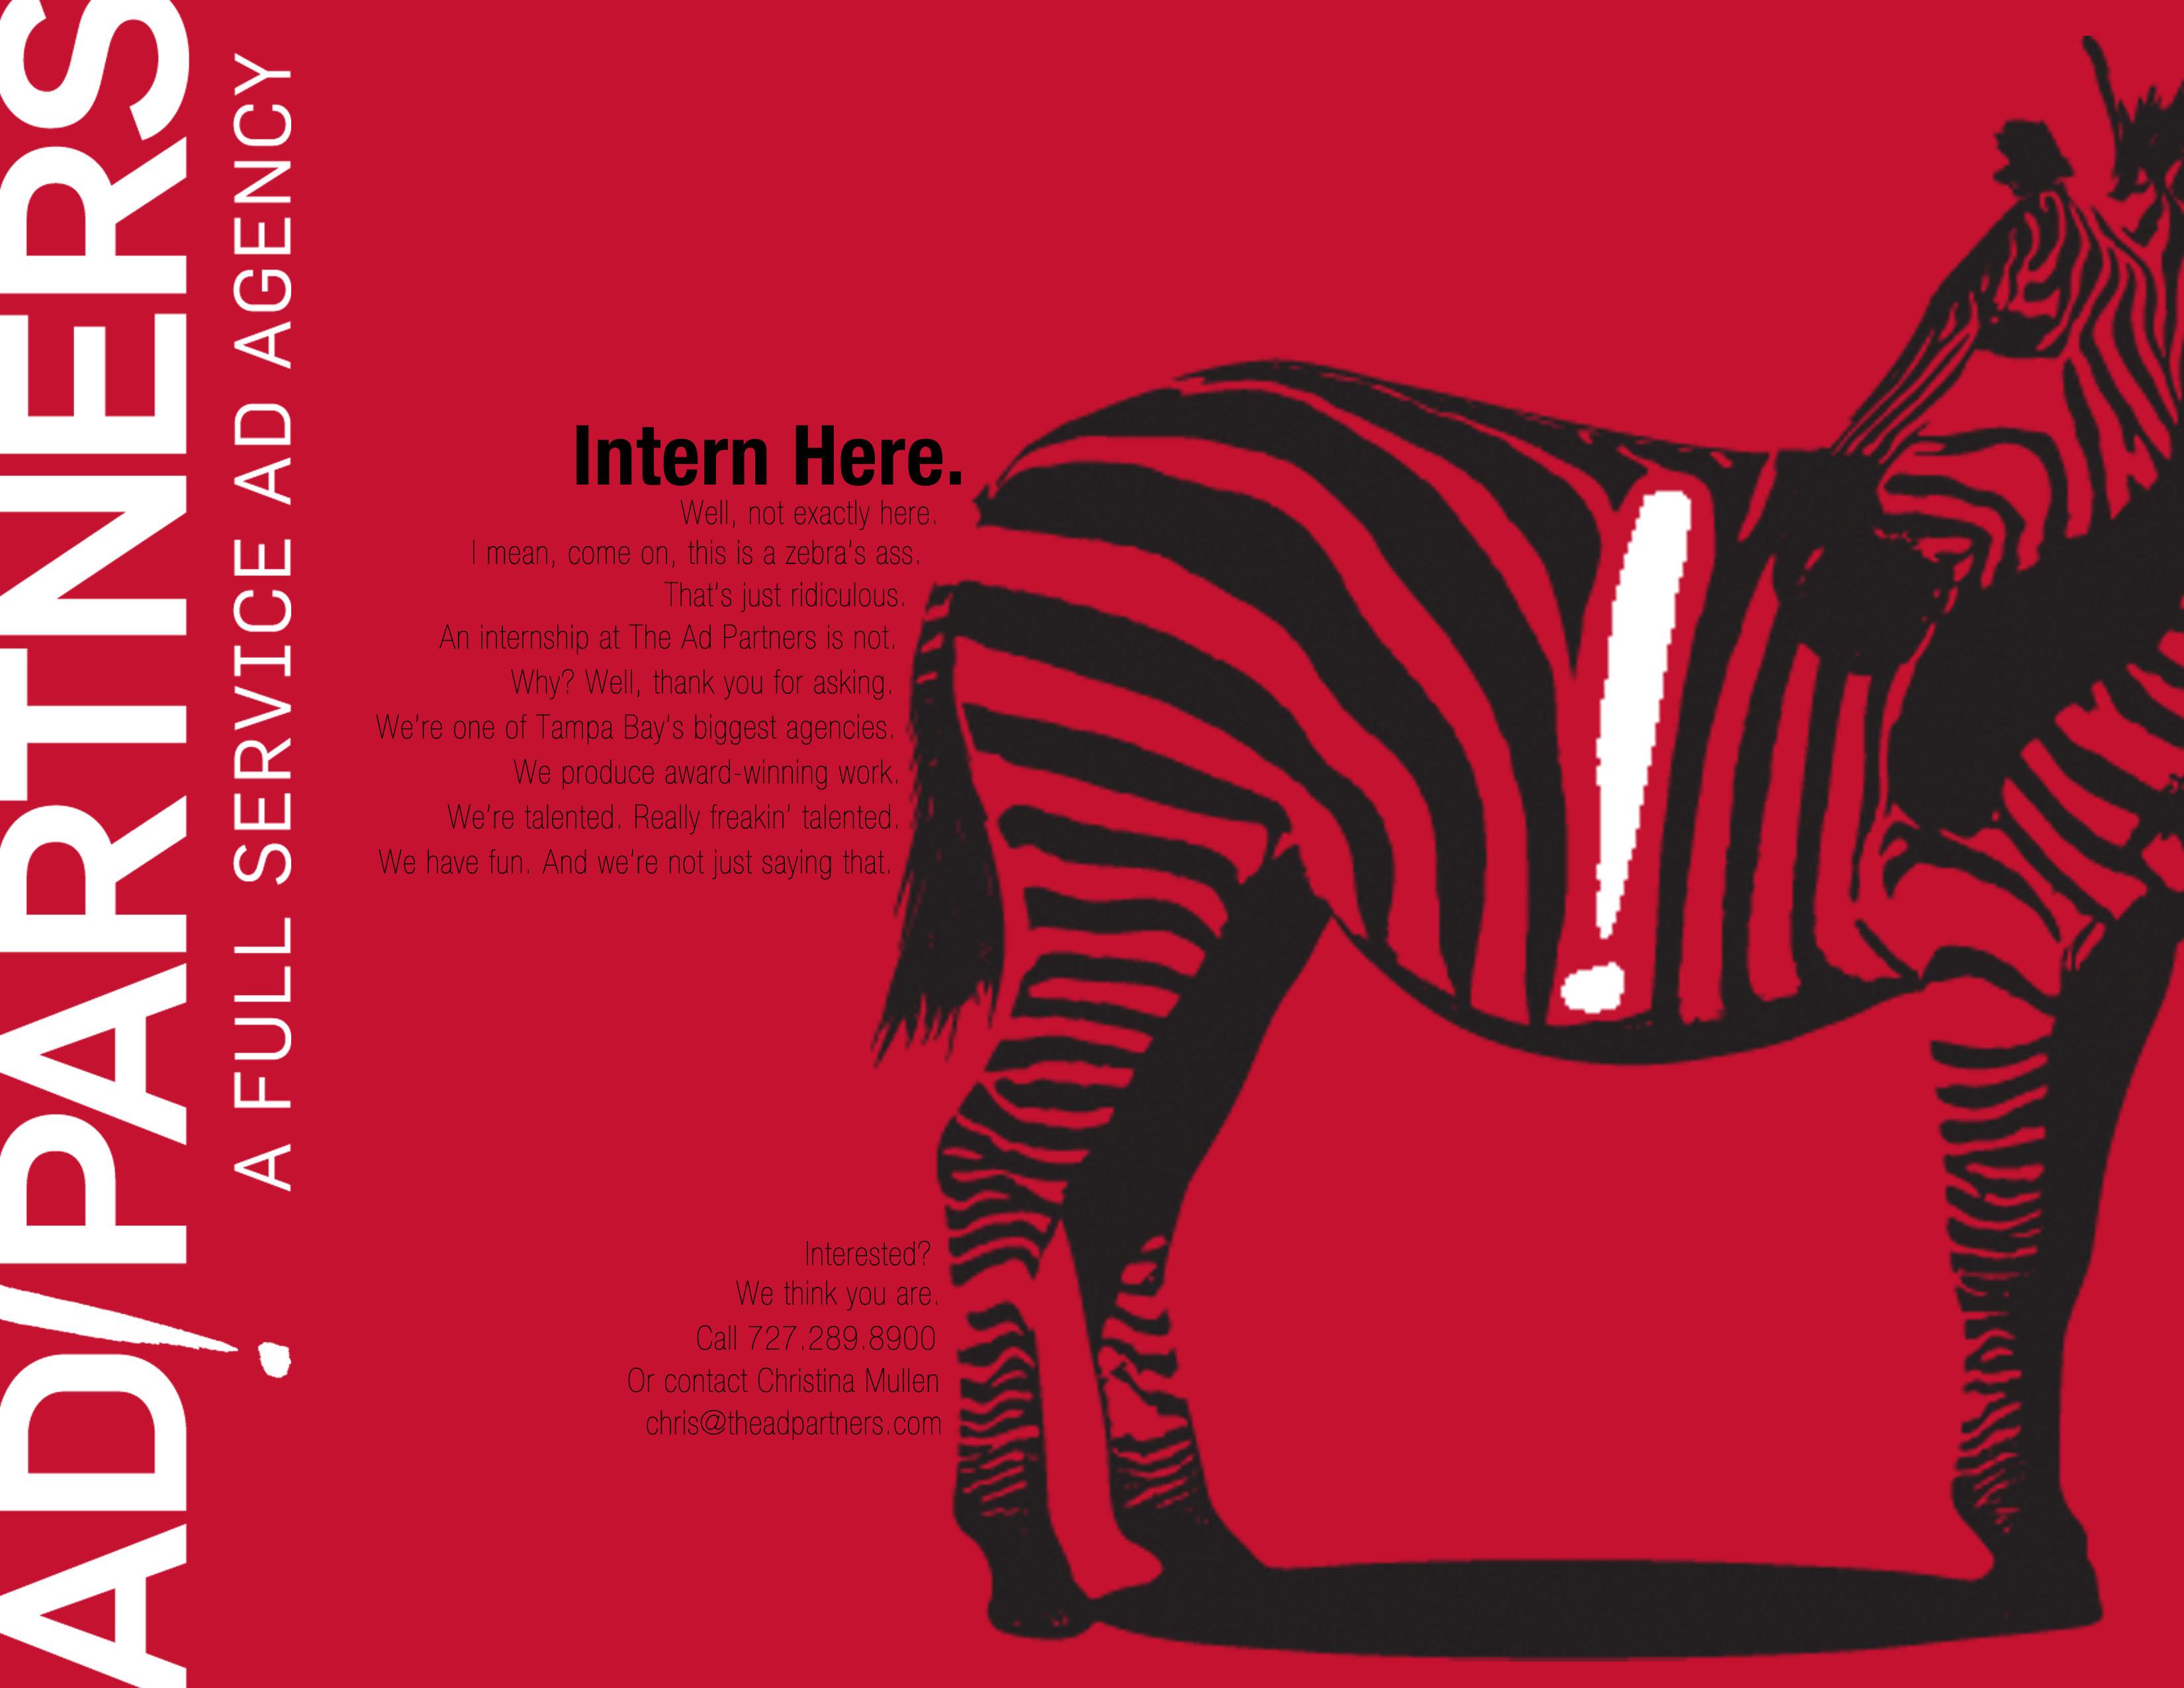 Internships Internship Search And Intern Jobs Copywriting Thepenismightier